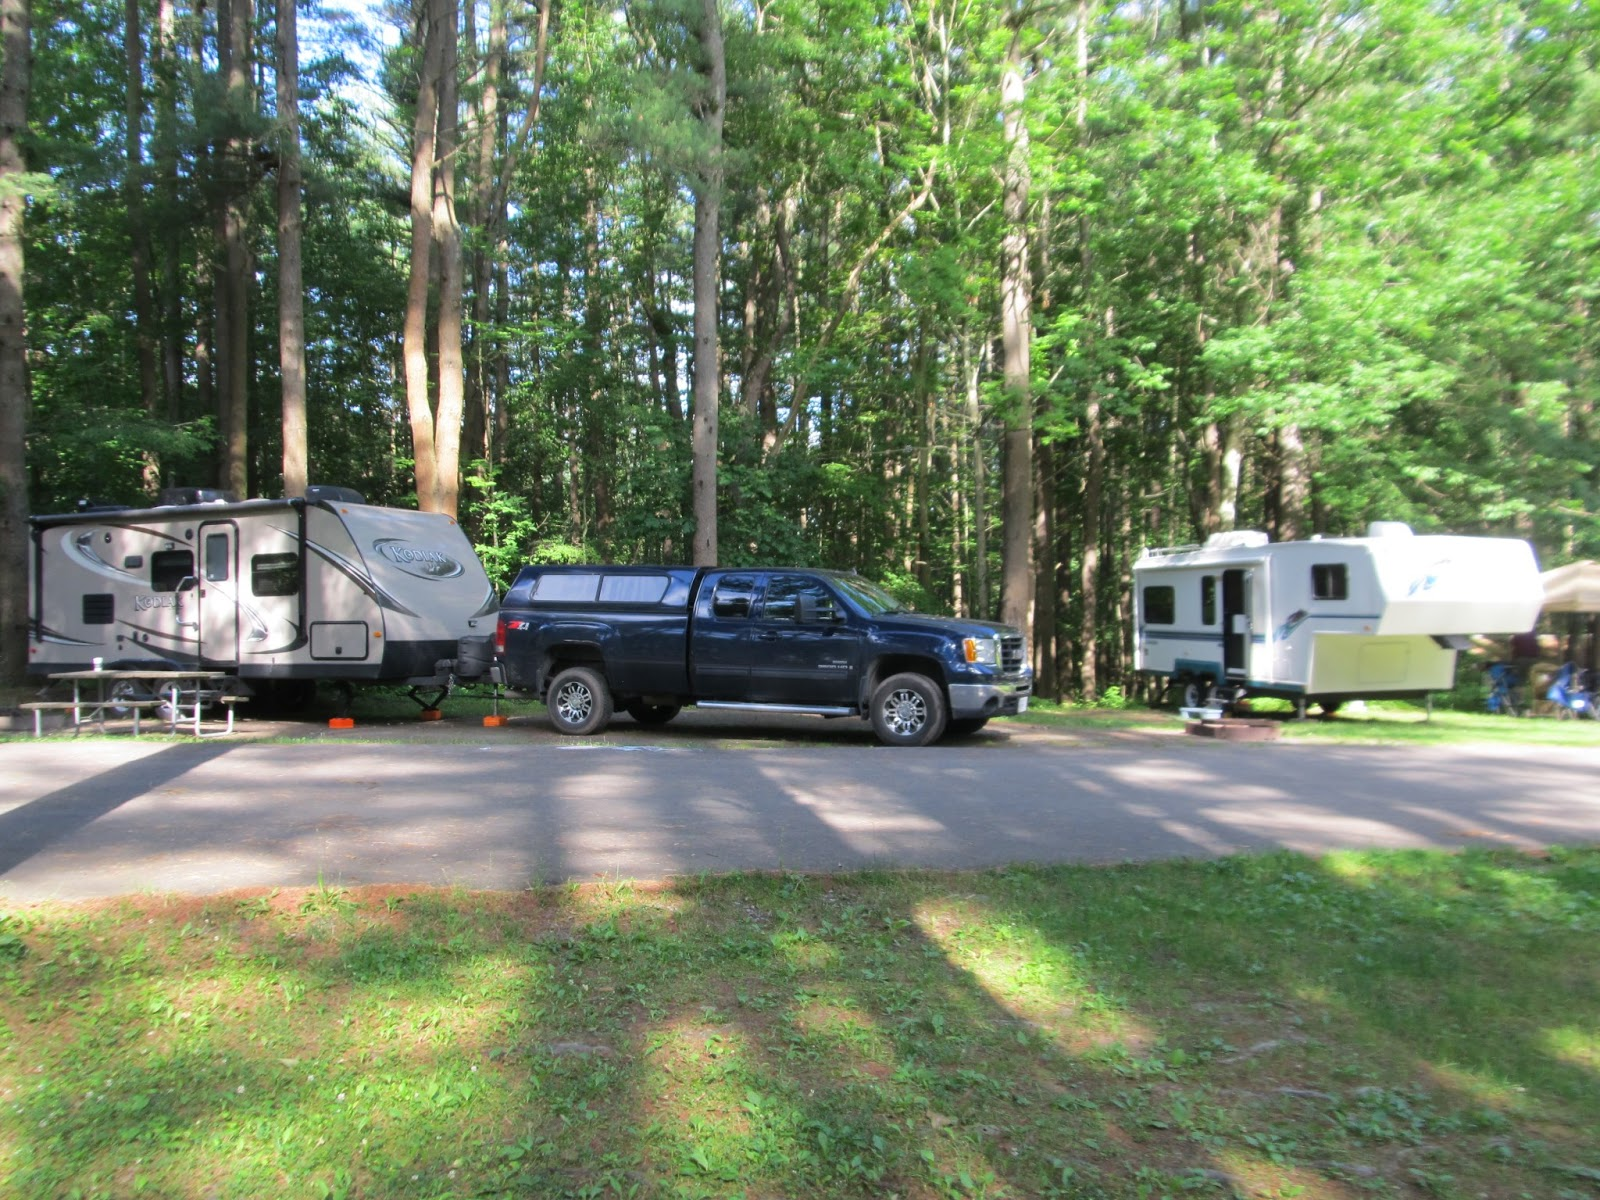 Rosemary S 2013 Road Trip Day 45 Amp 46 Niagara Falls On